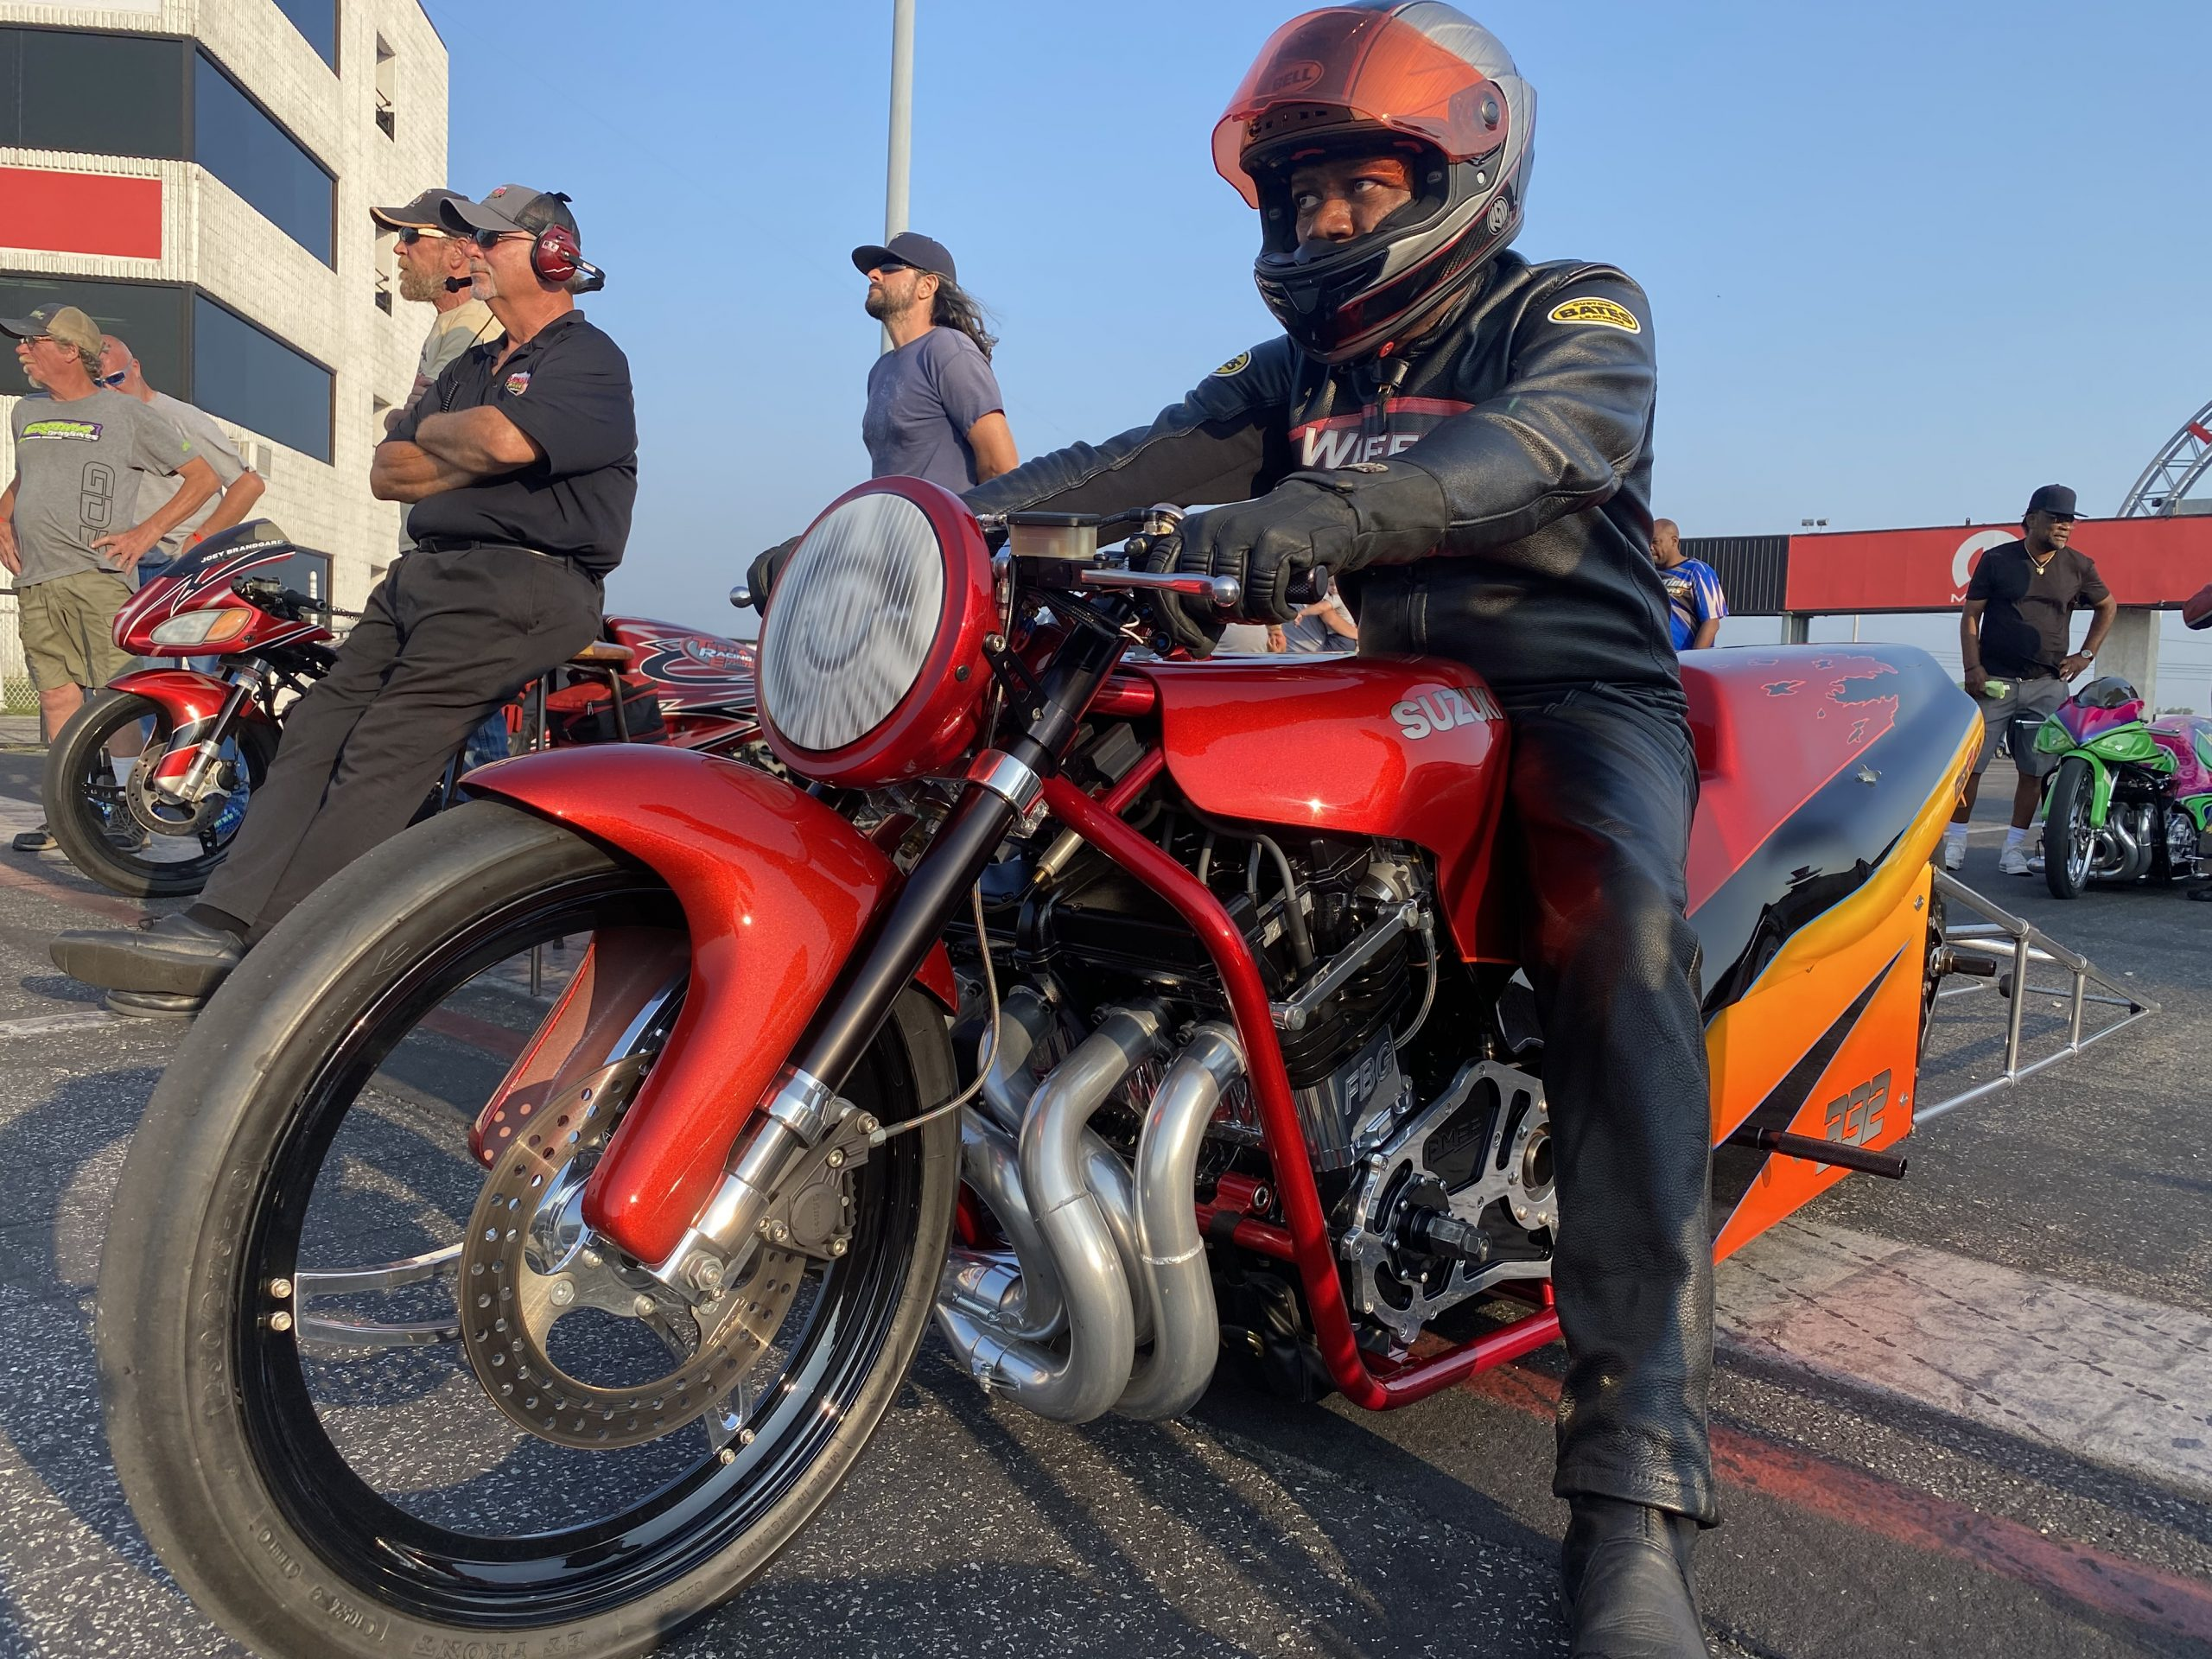 4.60 Drag Bike Racing, Wheeler Racing